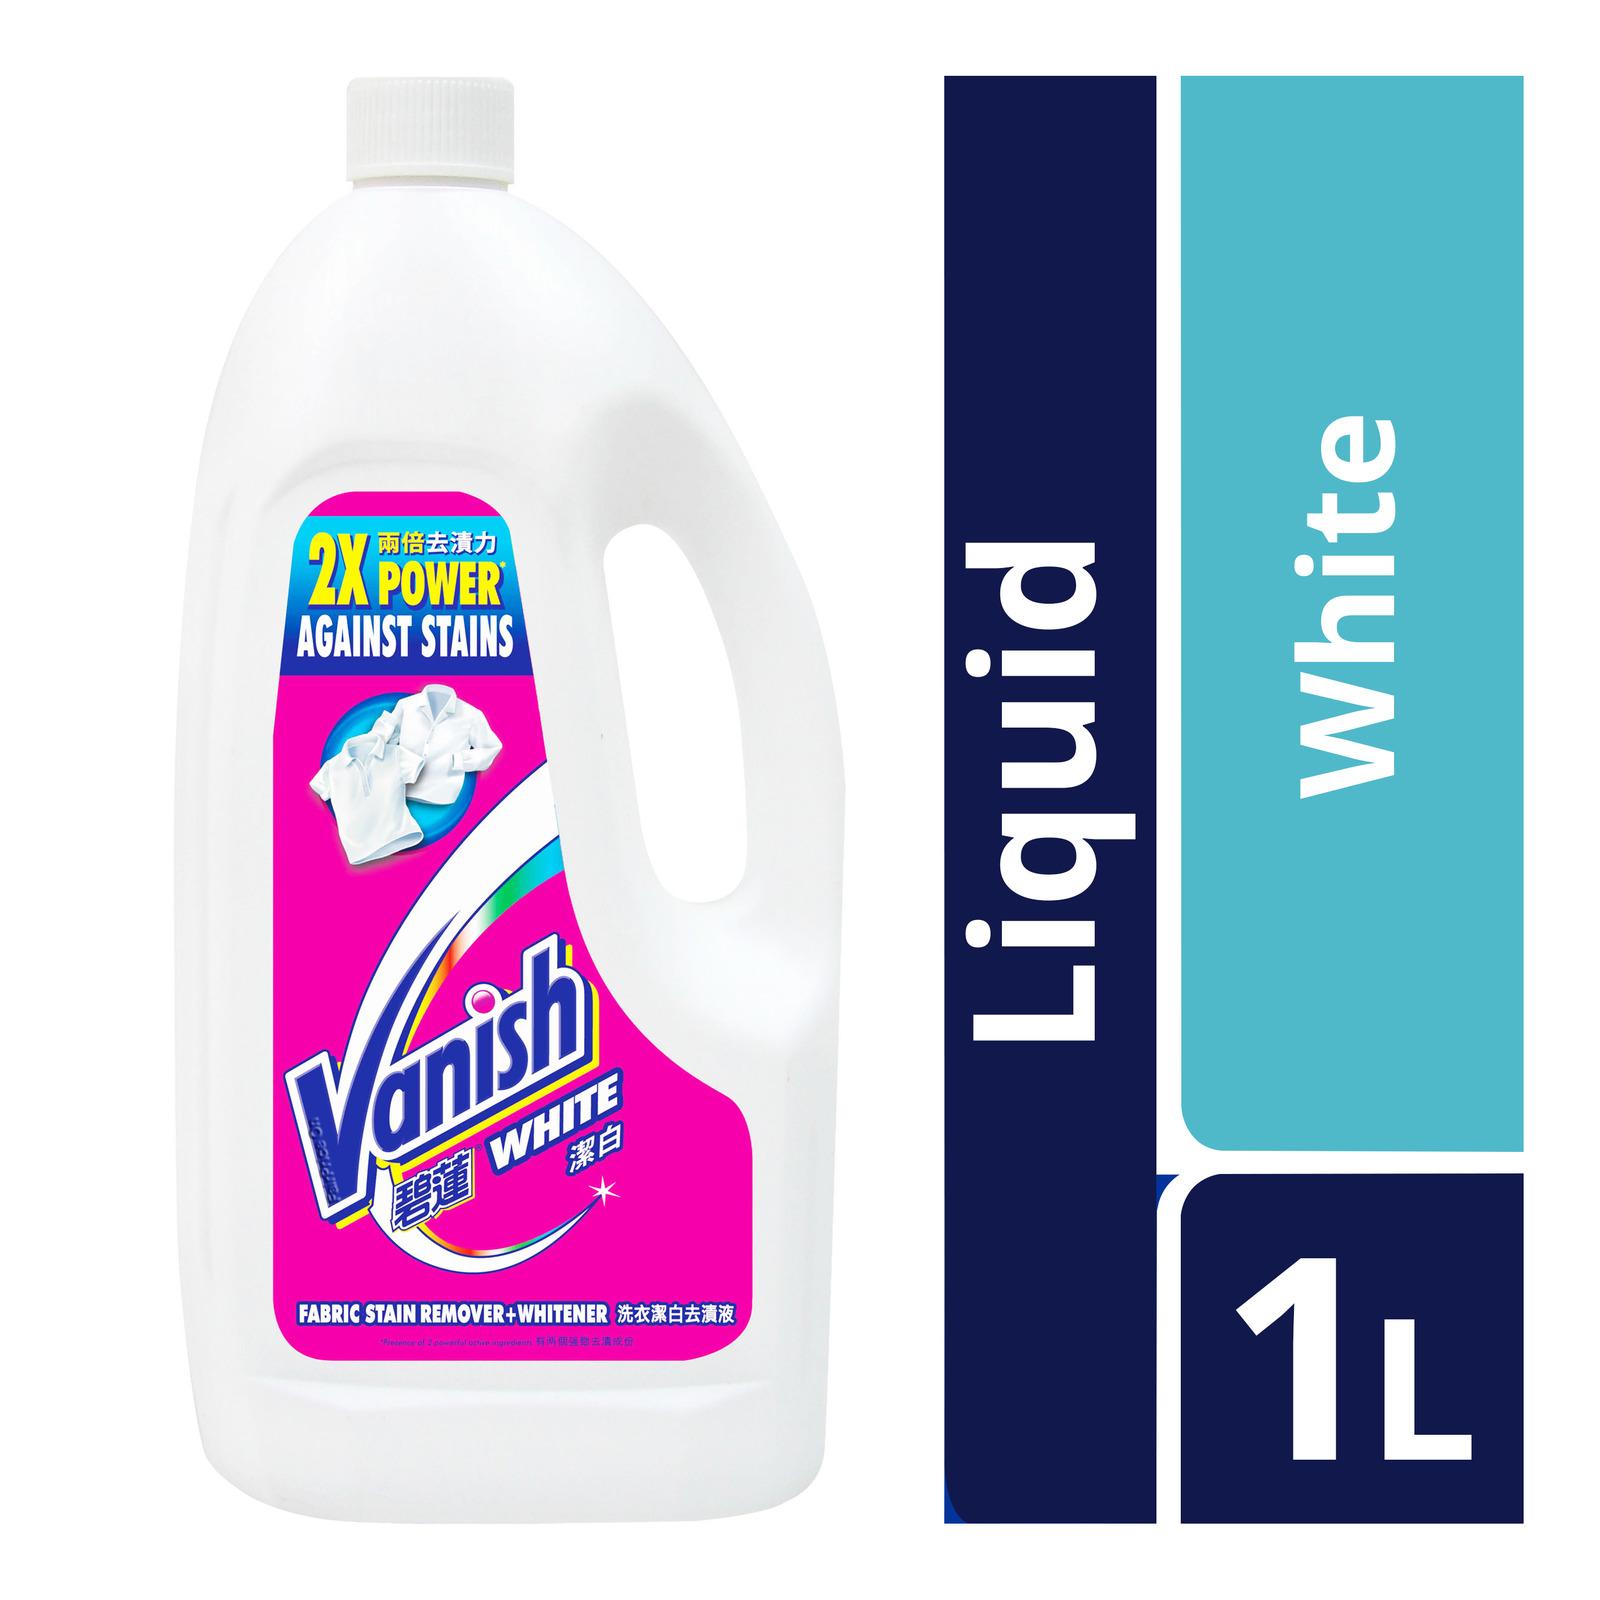 Vanish Liquid Fabric Stain Remover - White